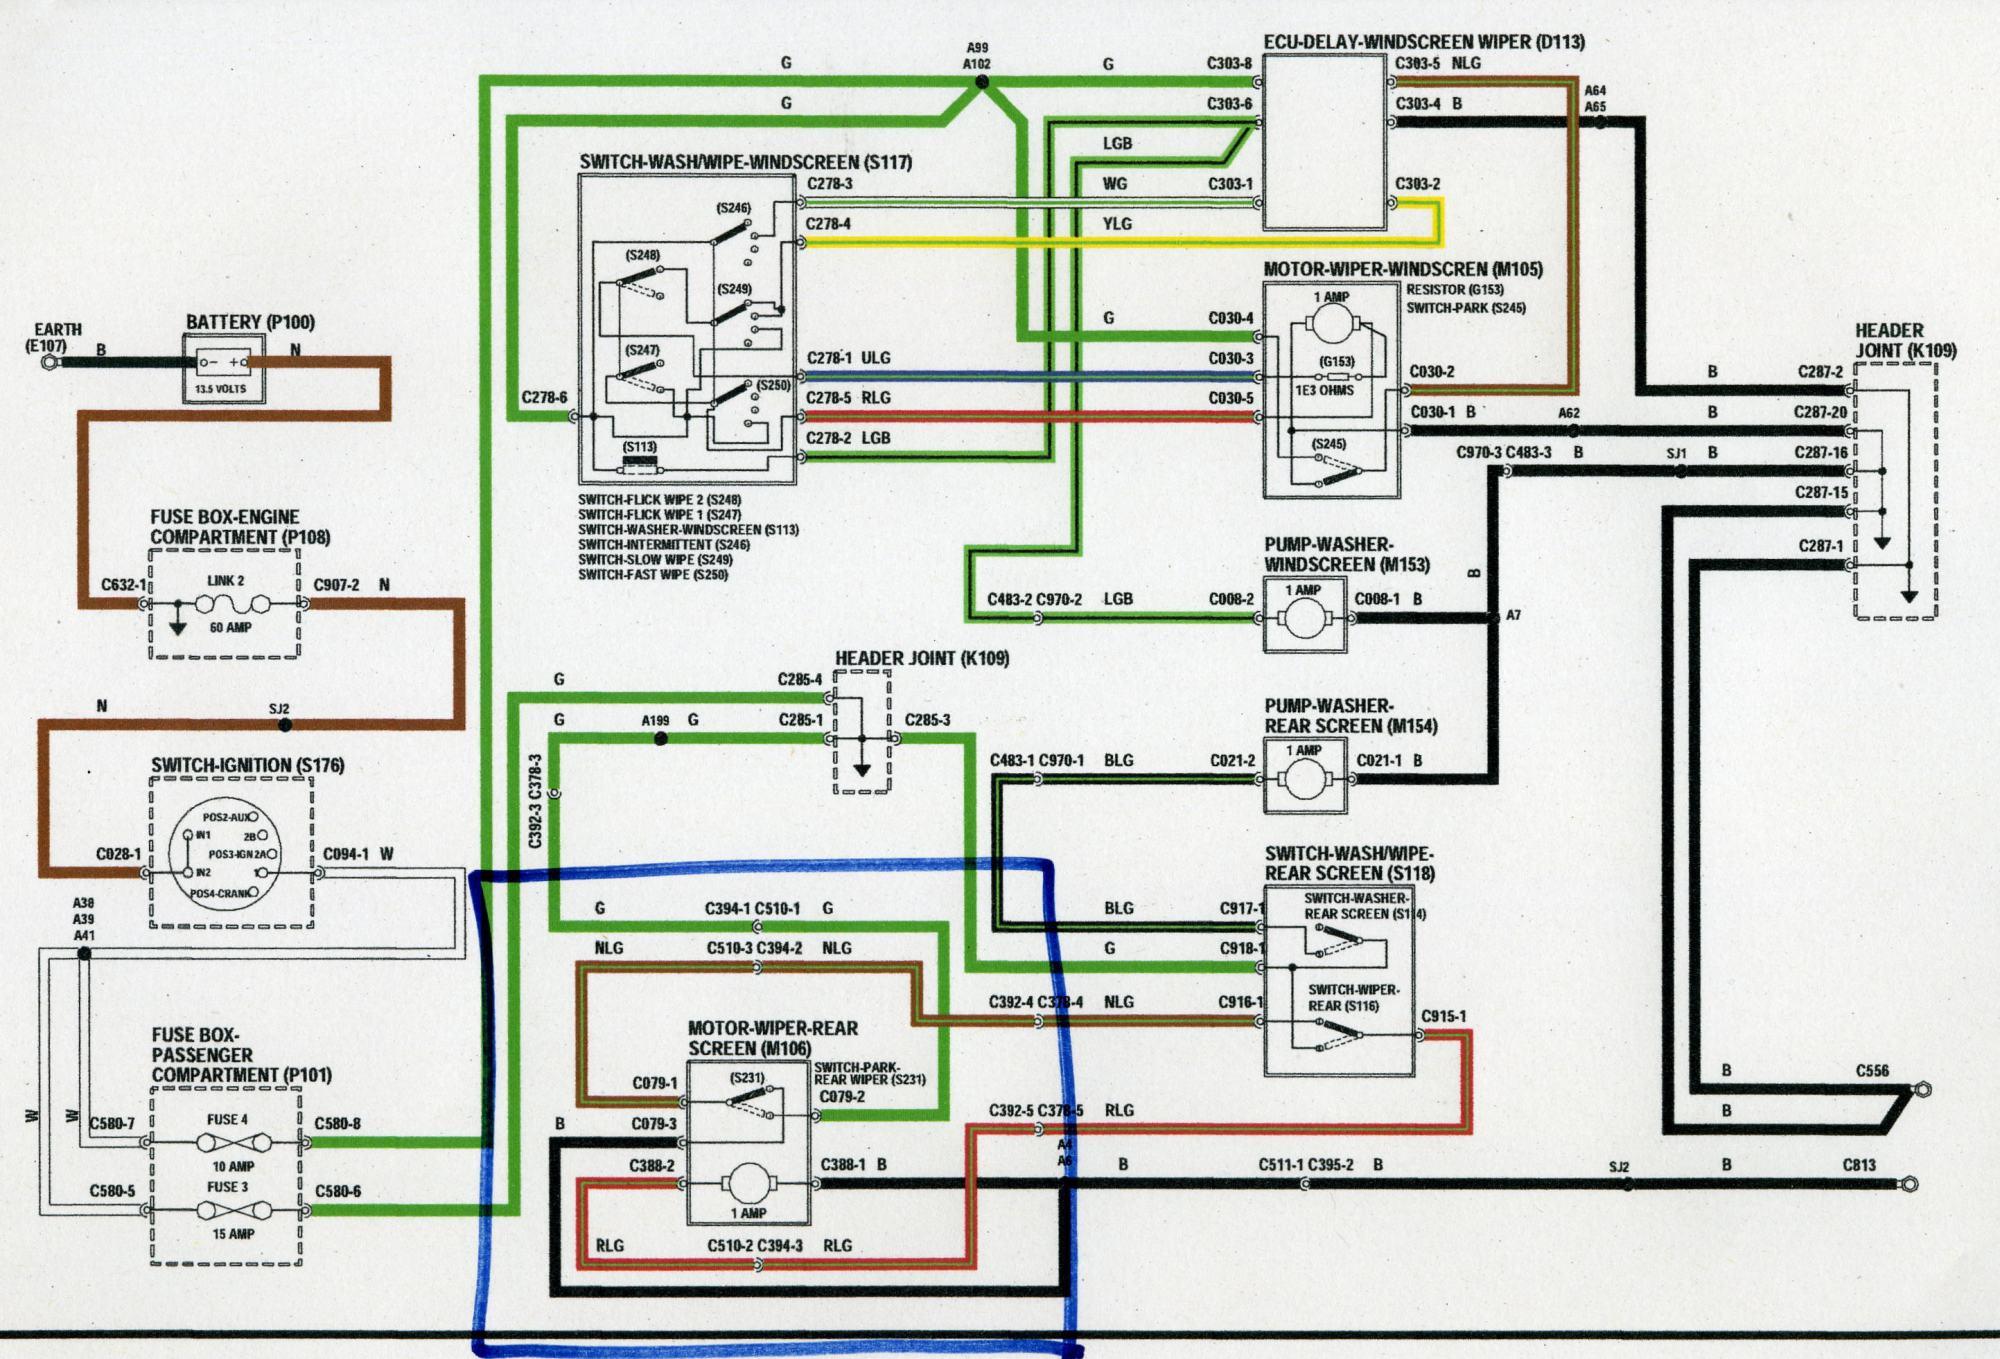 Land Rover Defender Fuse Box Diagram 110 Hight Resolution Of Rear Wiper Motor Wiring Forum Lr4x4 The